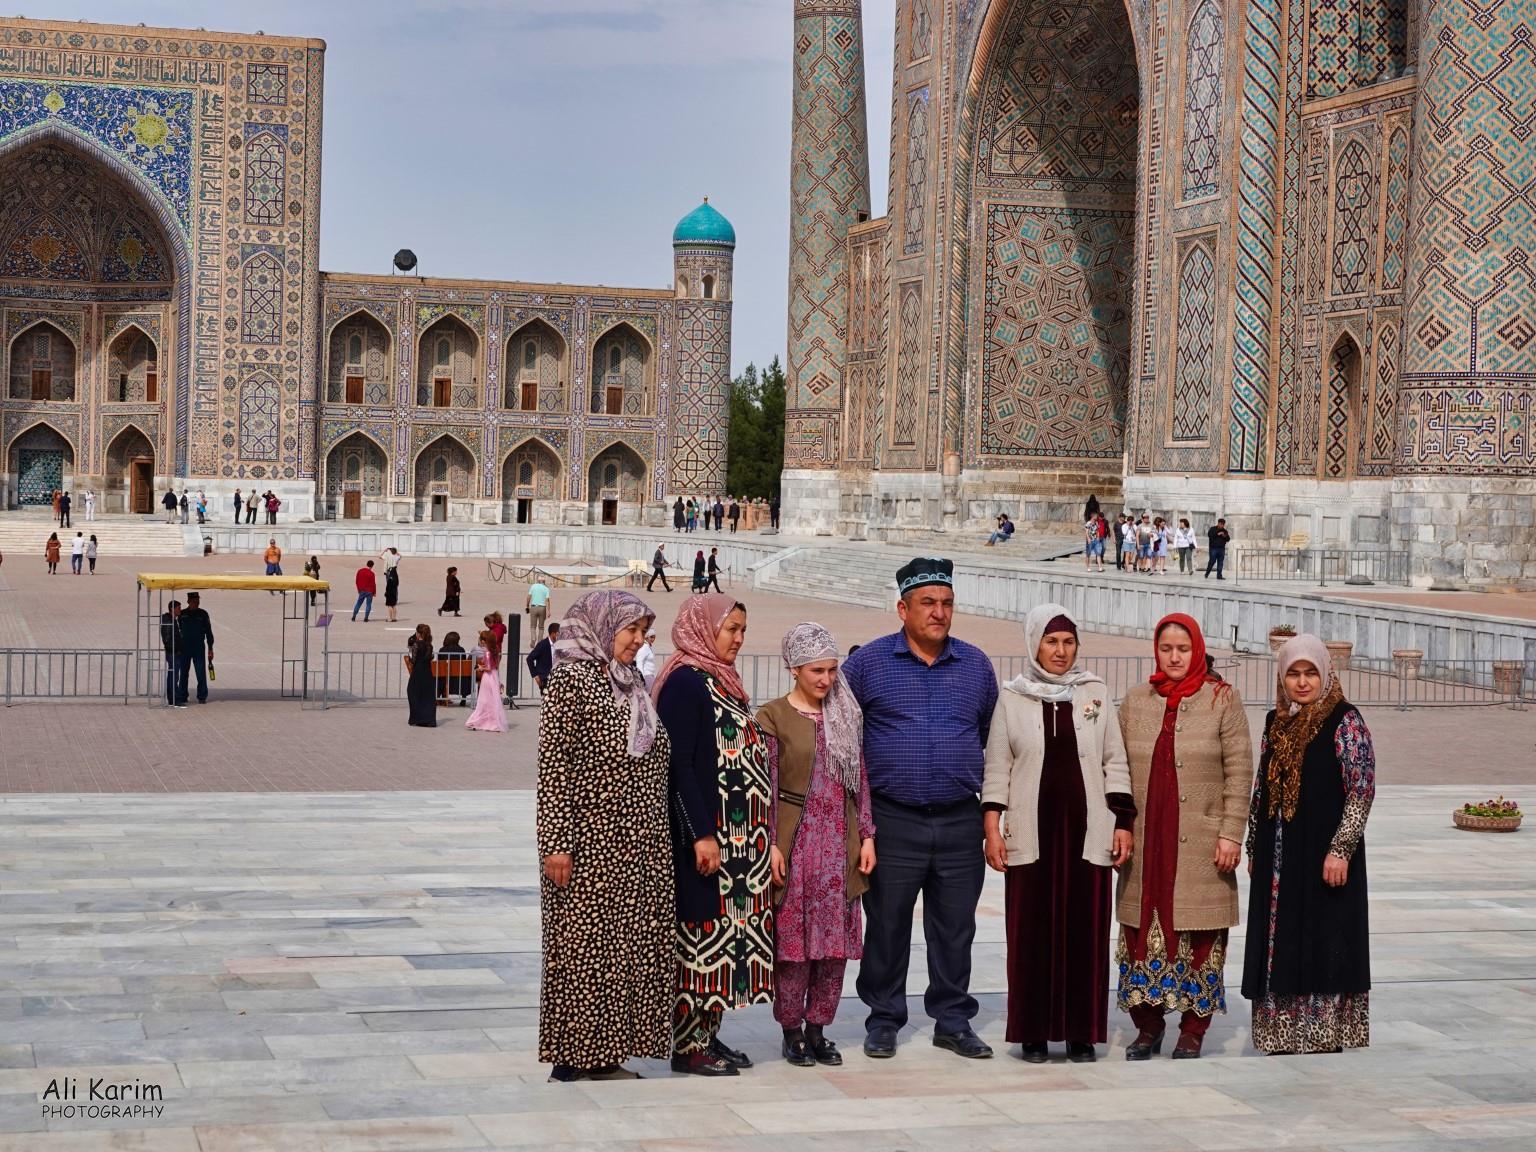 More Samarkand, Local tourists